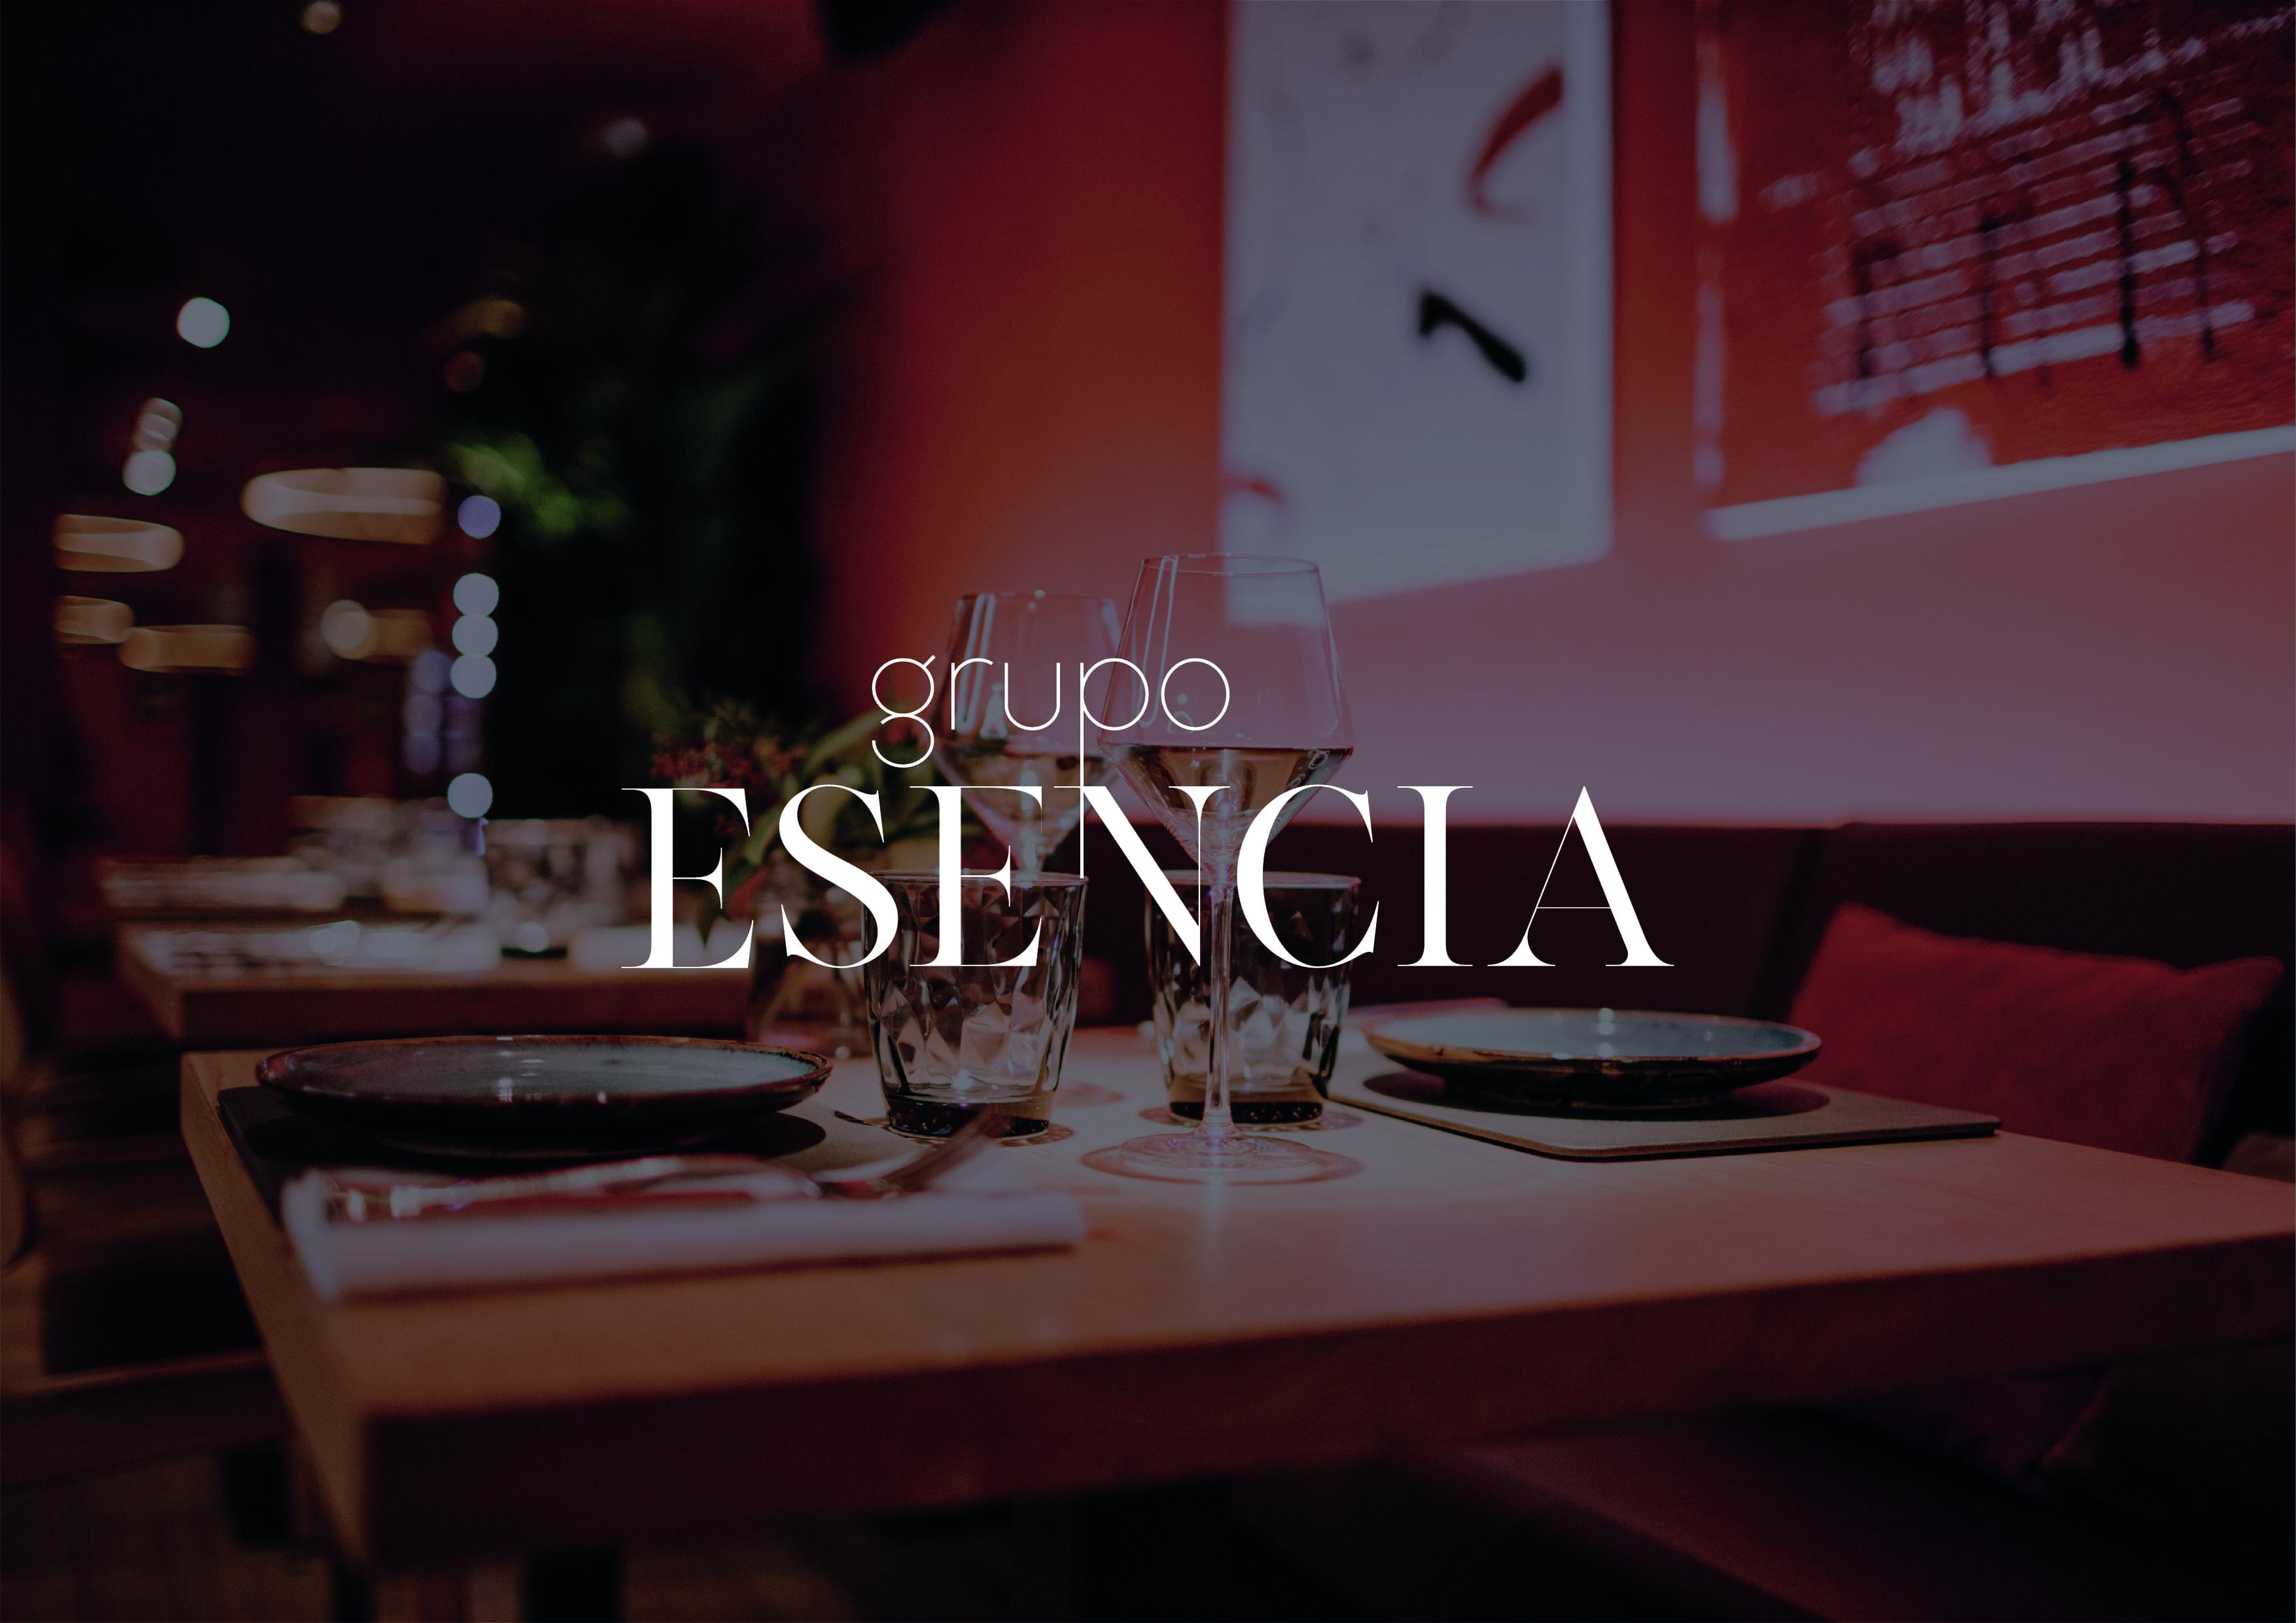 Grupo Esencia - Estrategia digital